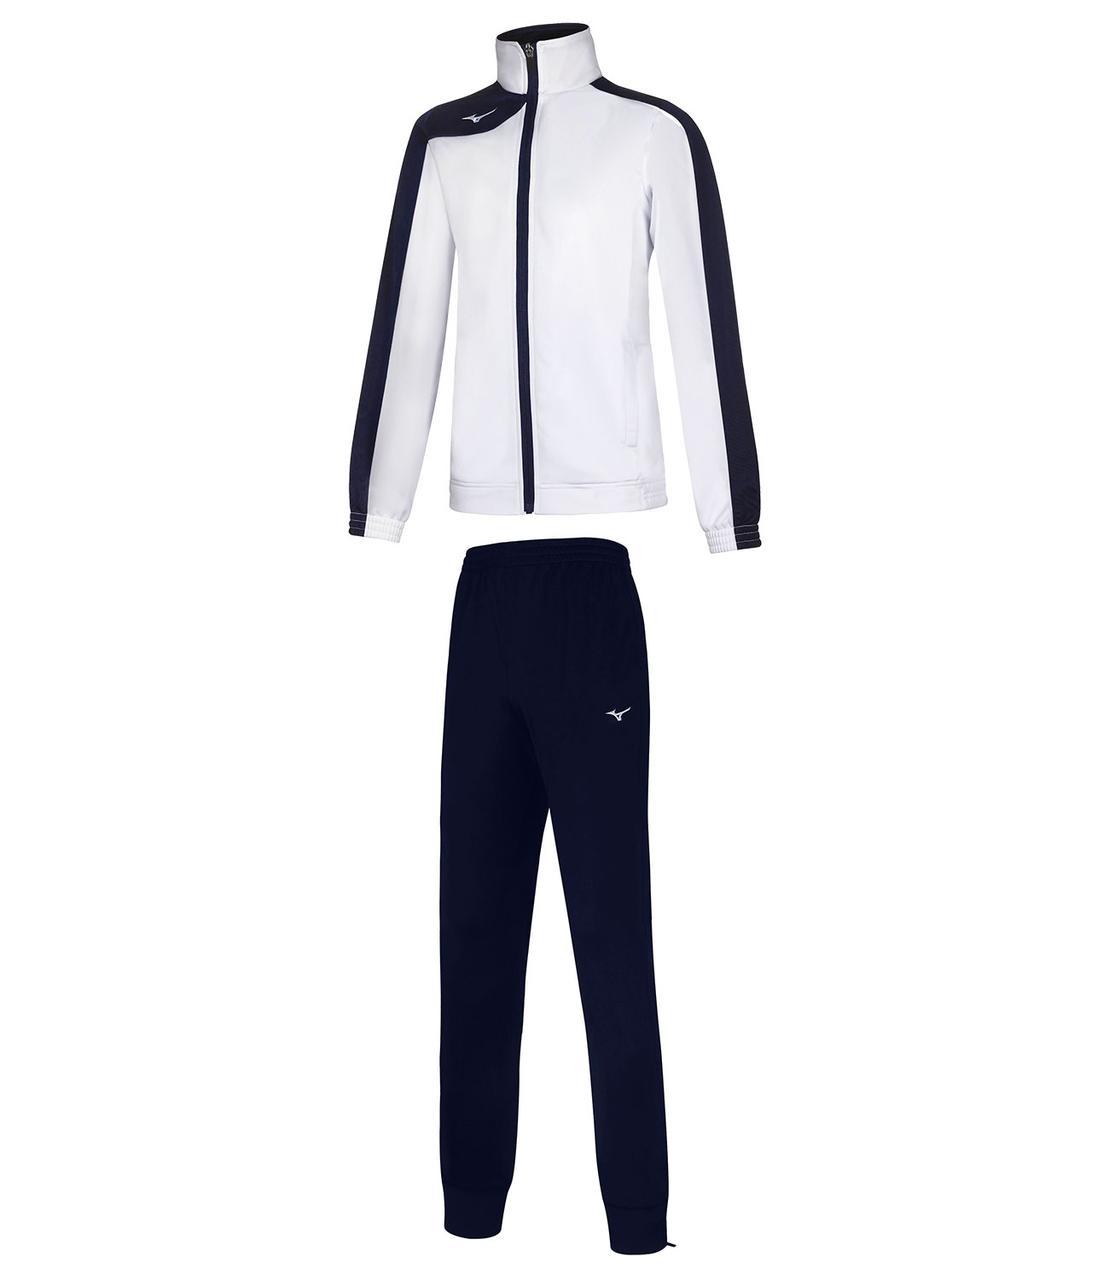 Спортивный костюм Mizuno Knitted Tracksuit Junior (32EG7406-71)